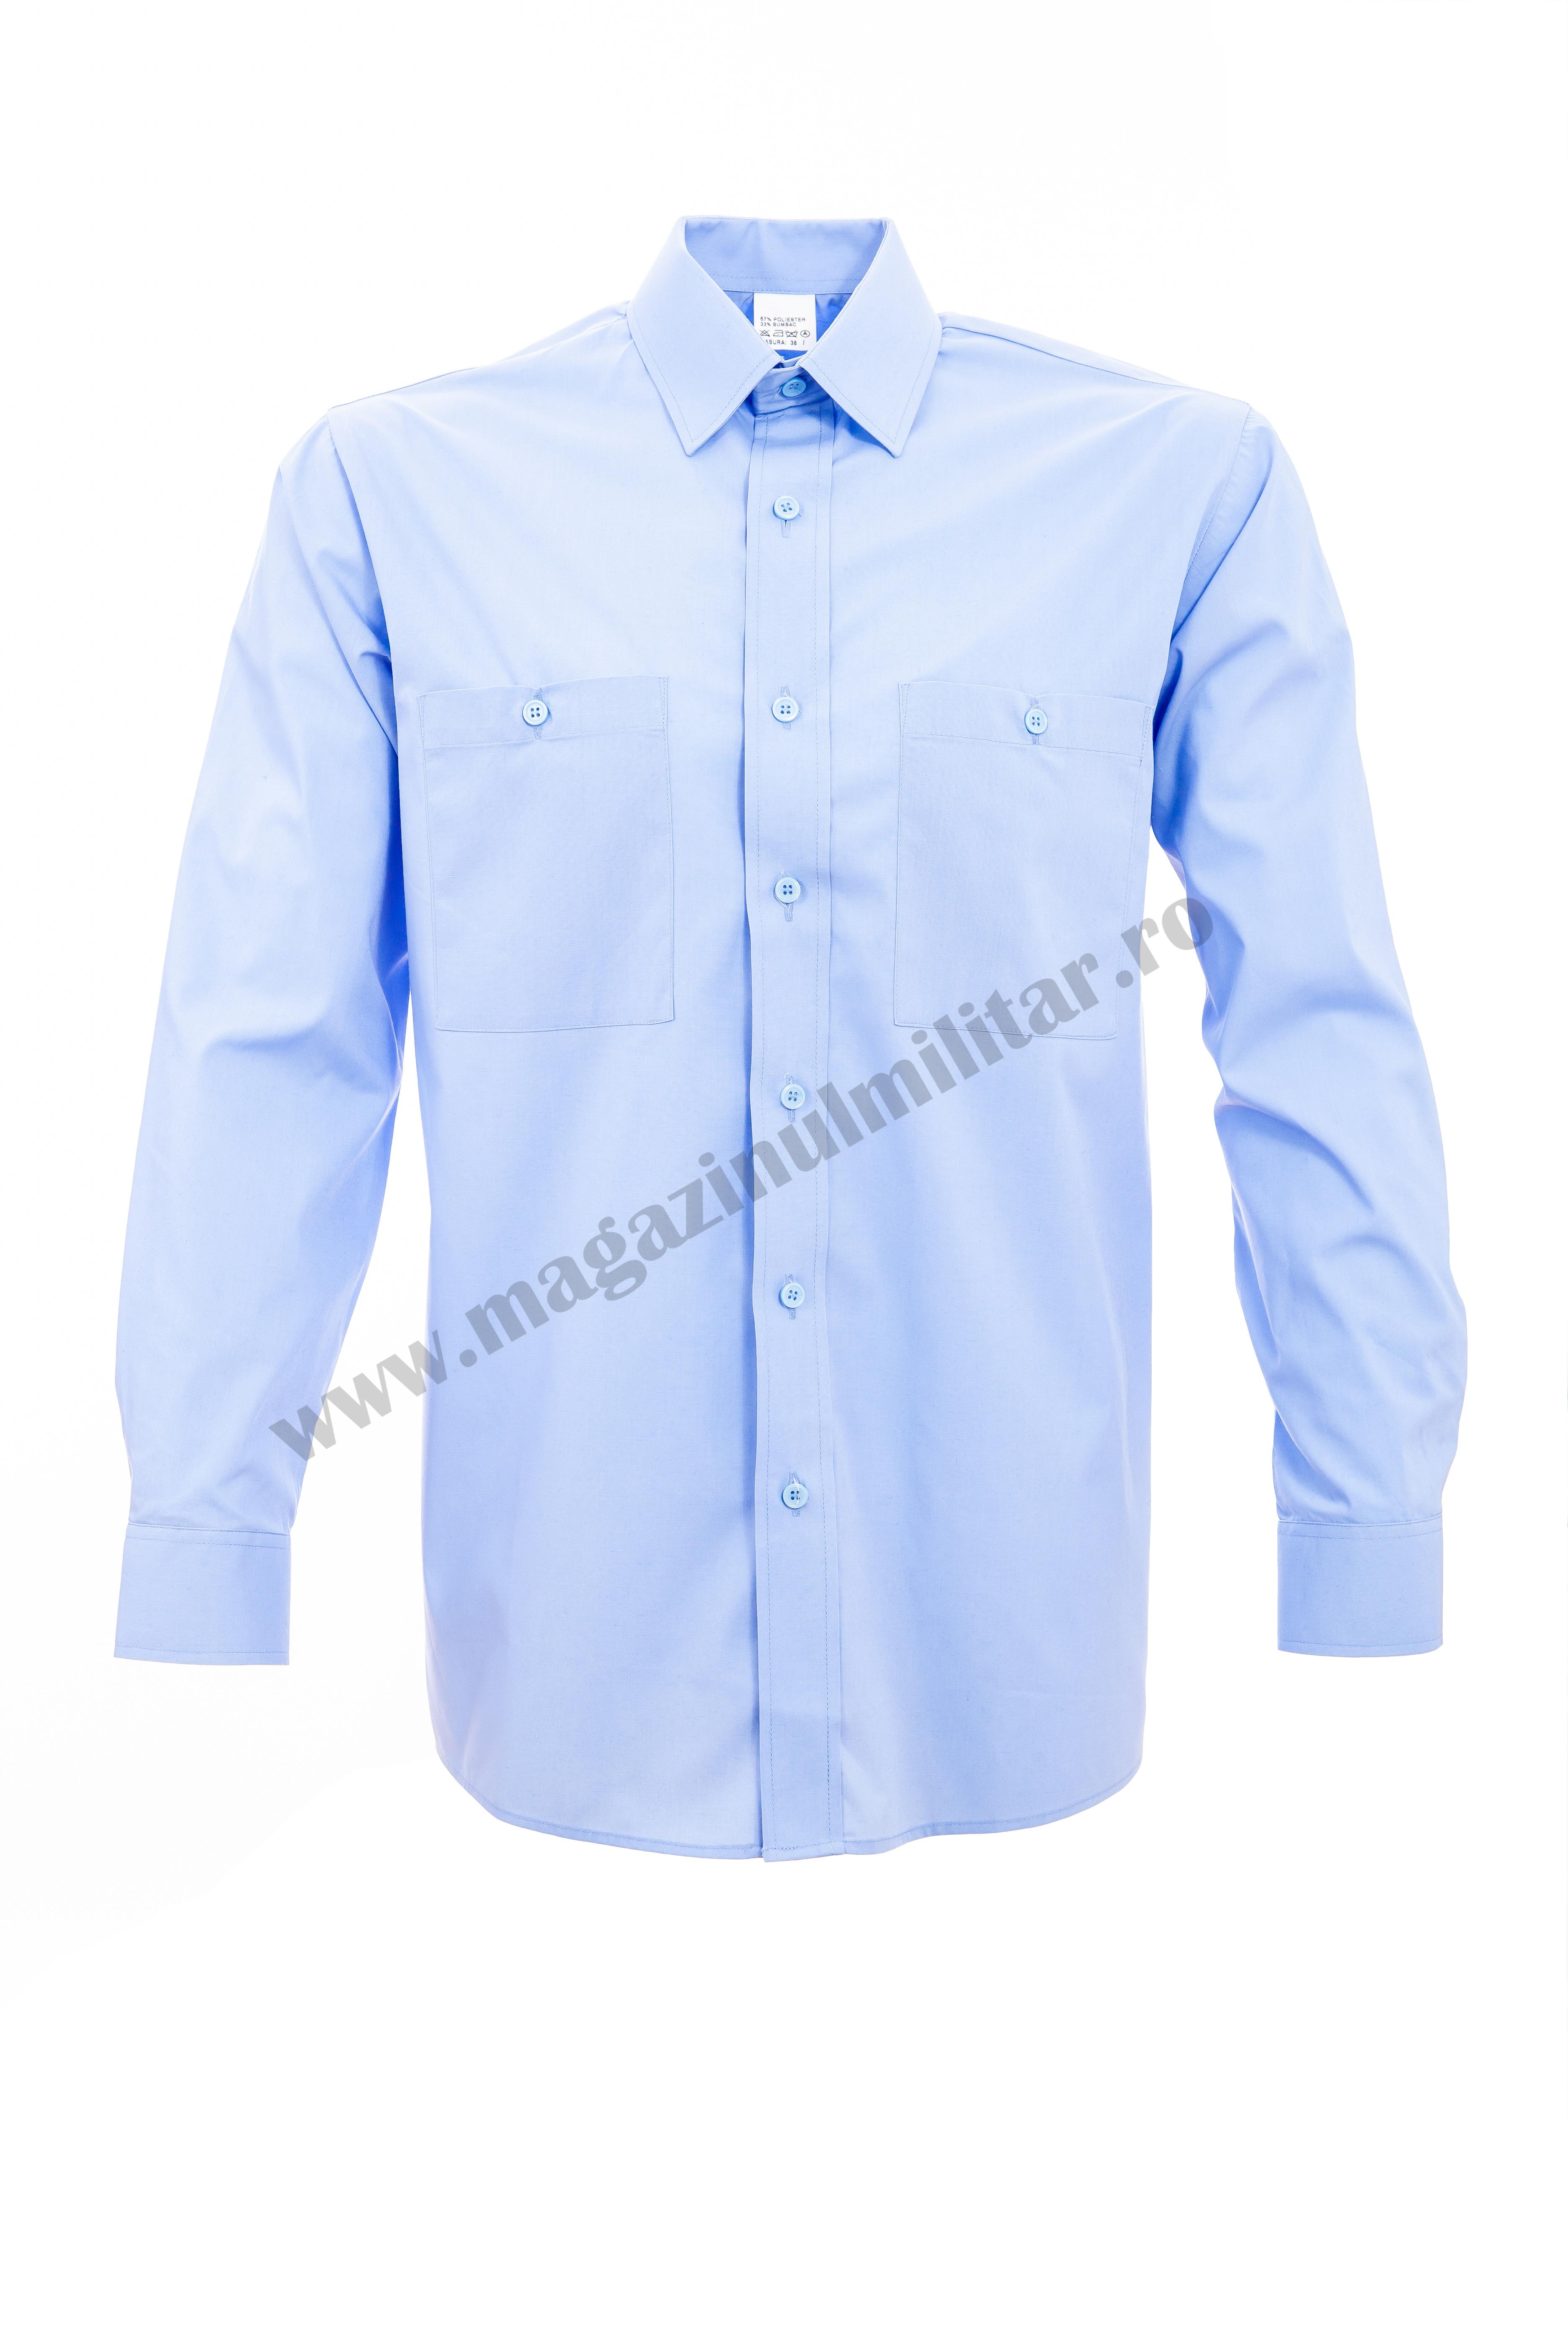 Camasa bleu, maneca lunga, barbati 0